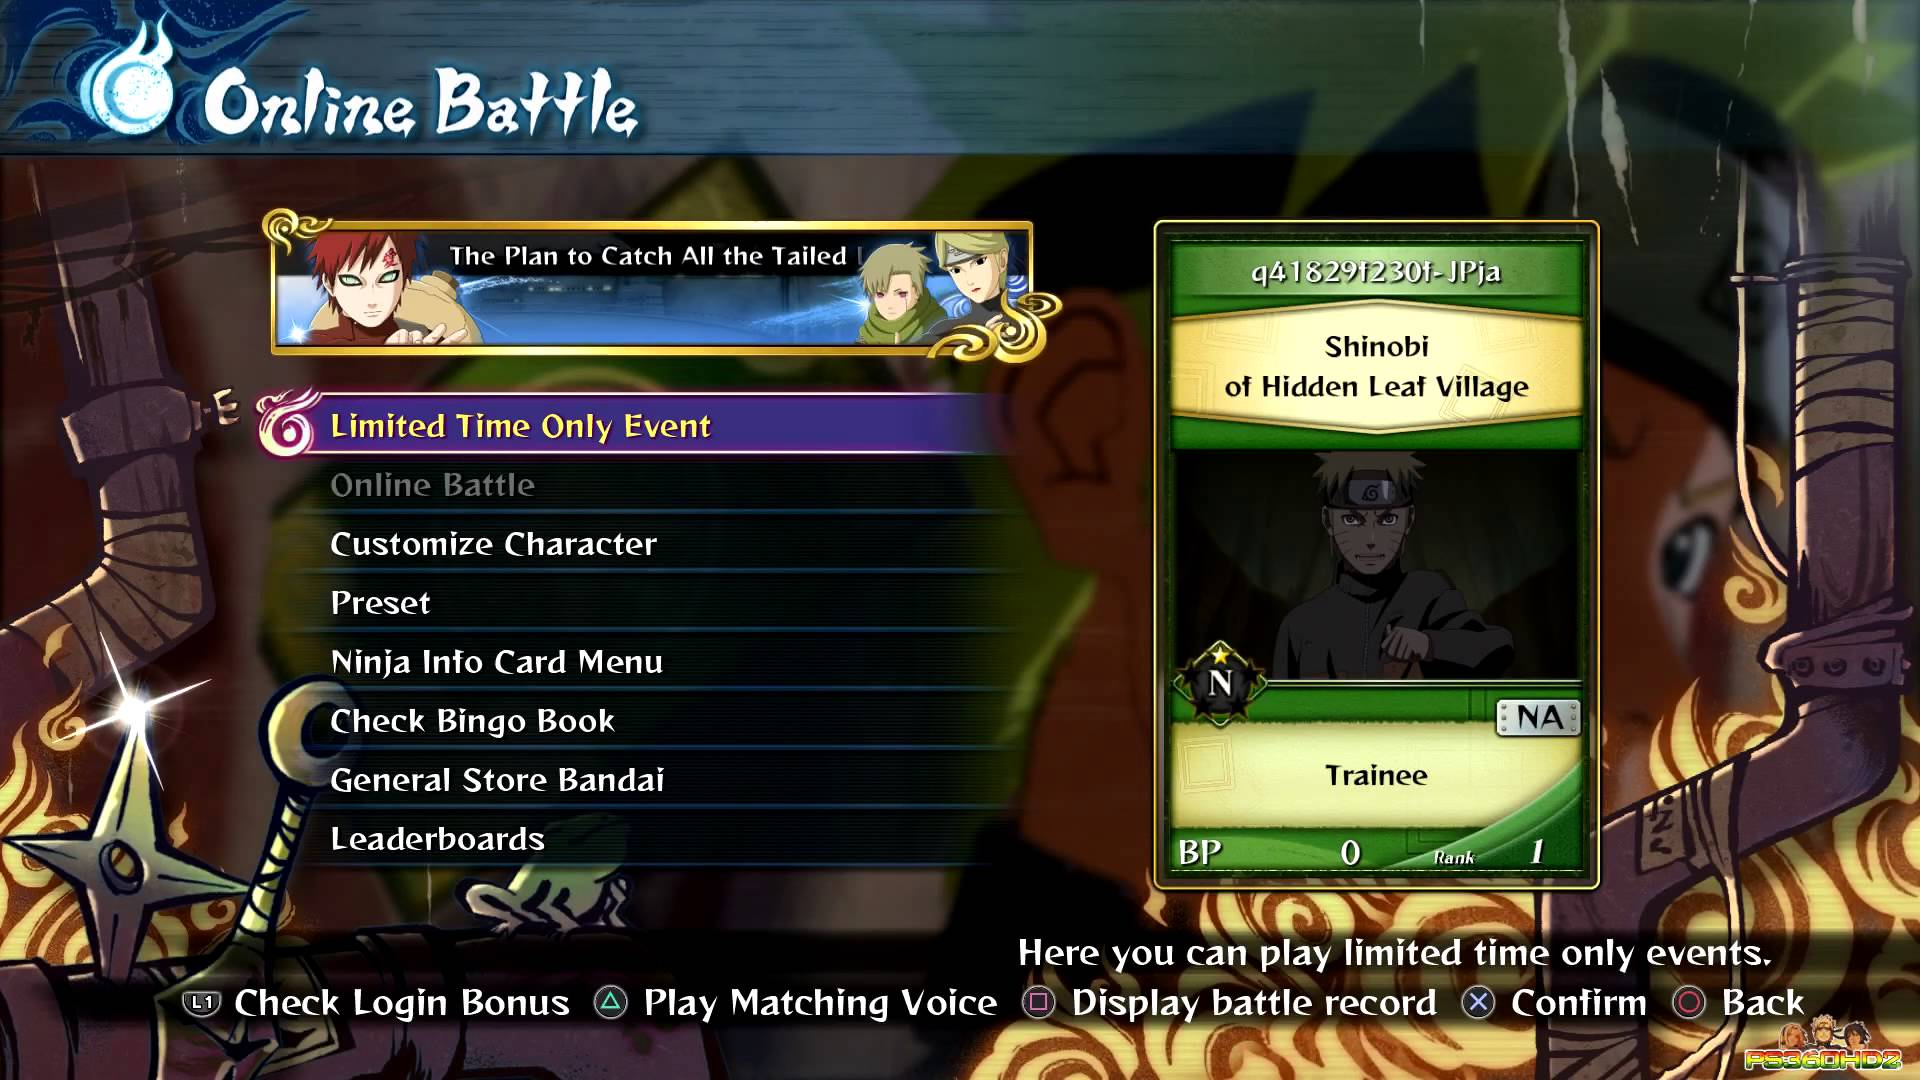 Naruto Shippuden: Ultimate Ninja Storm 4 Online Battle